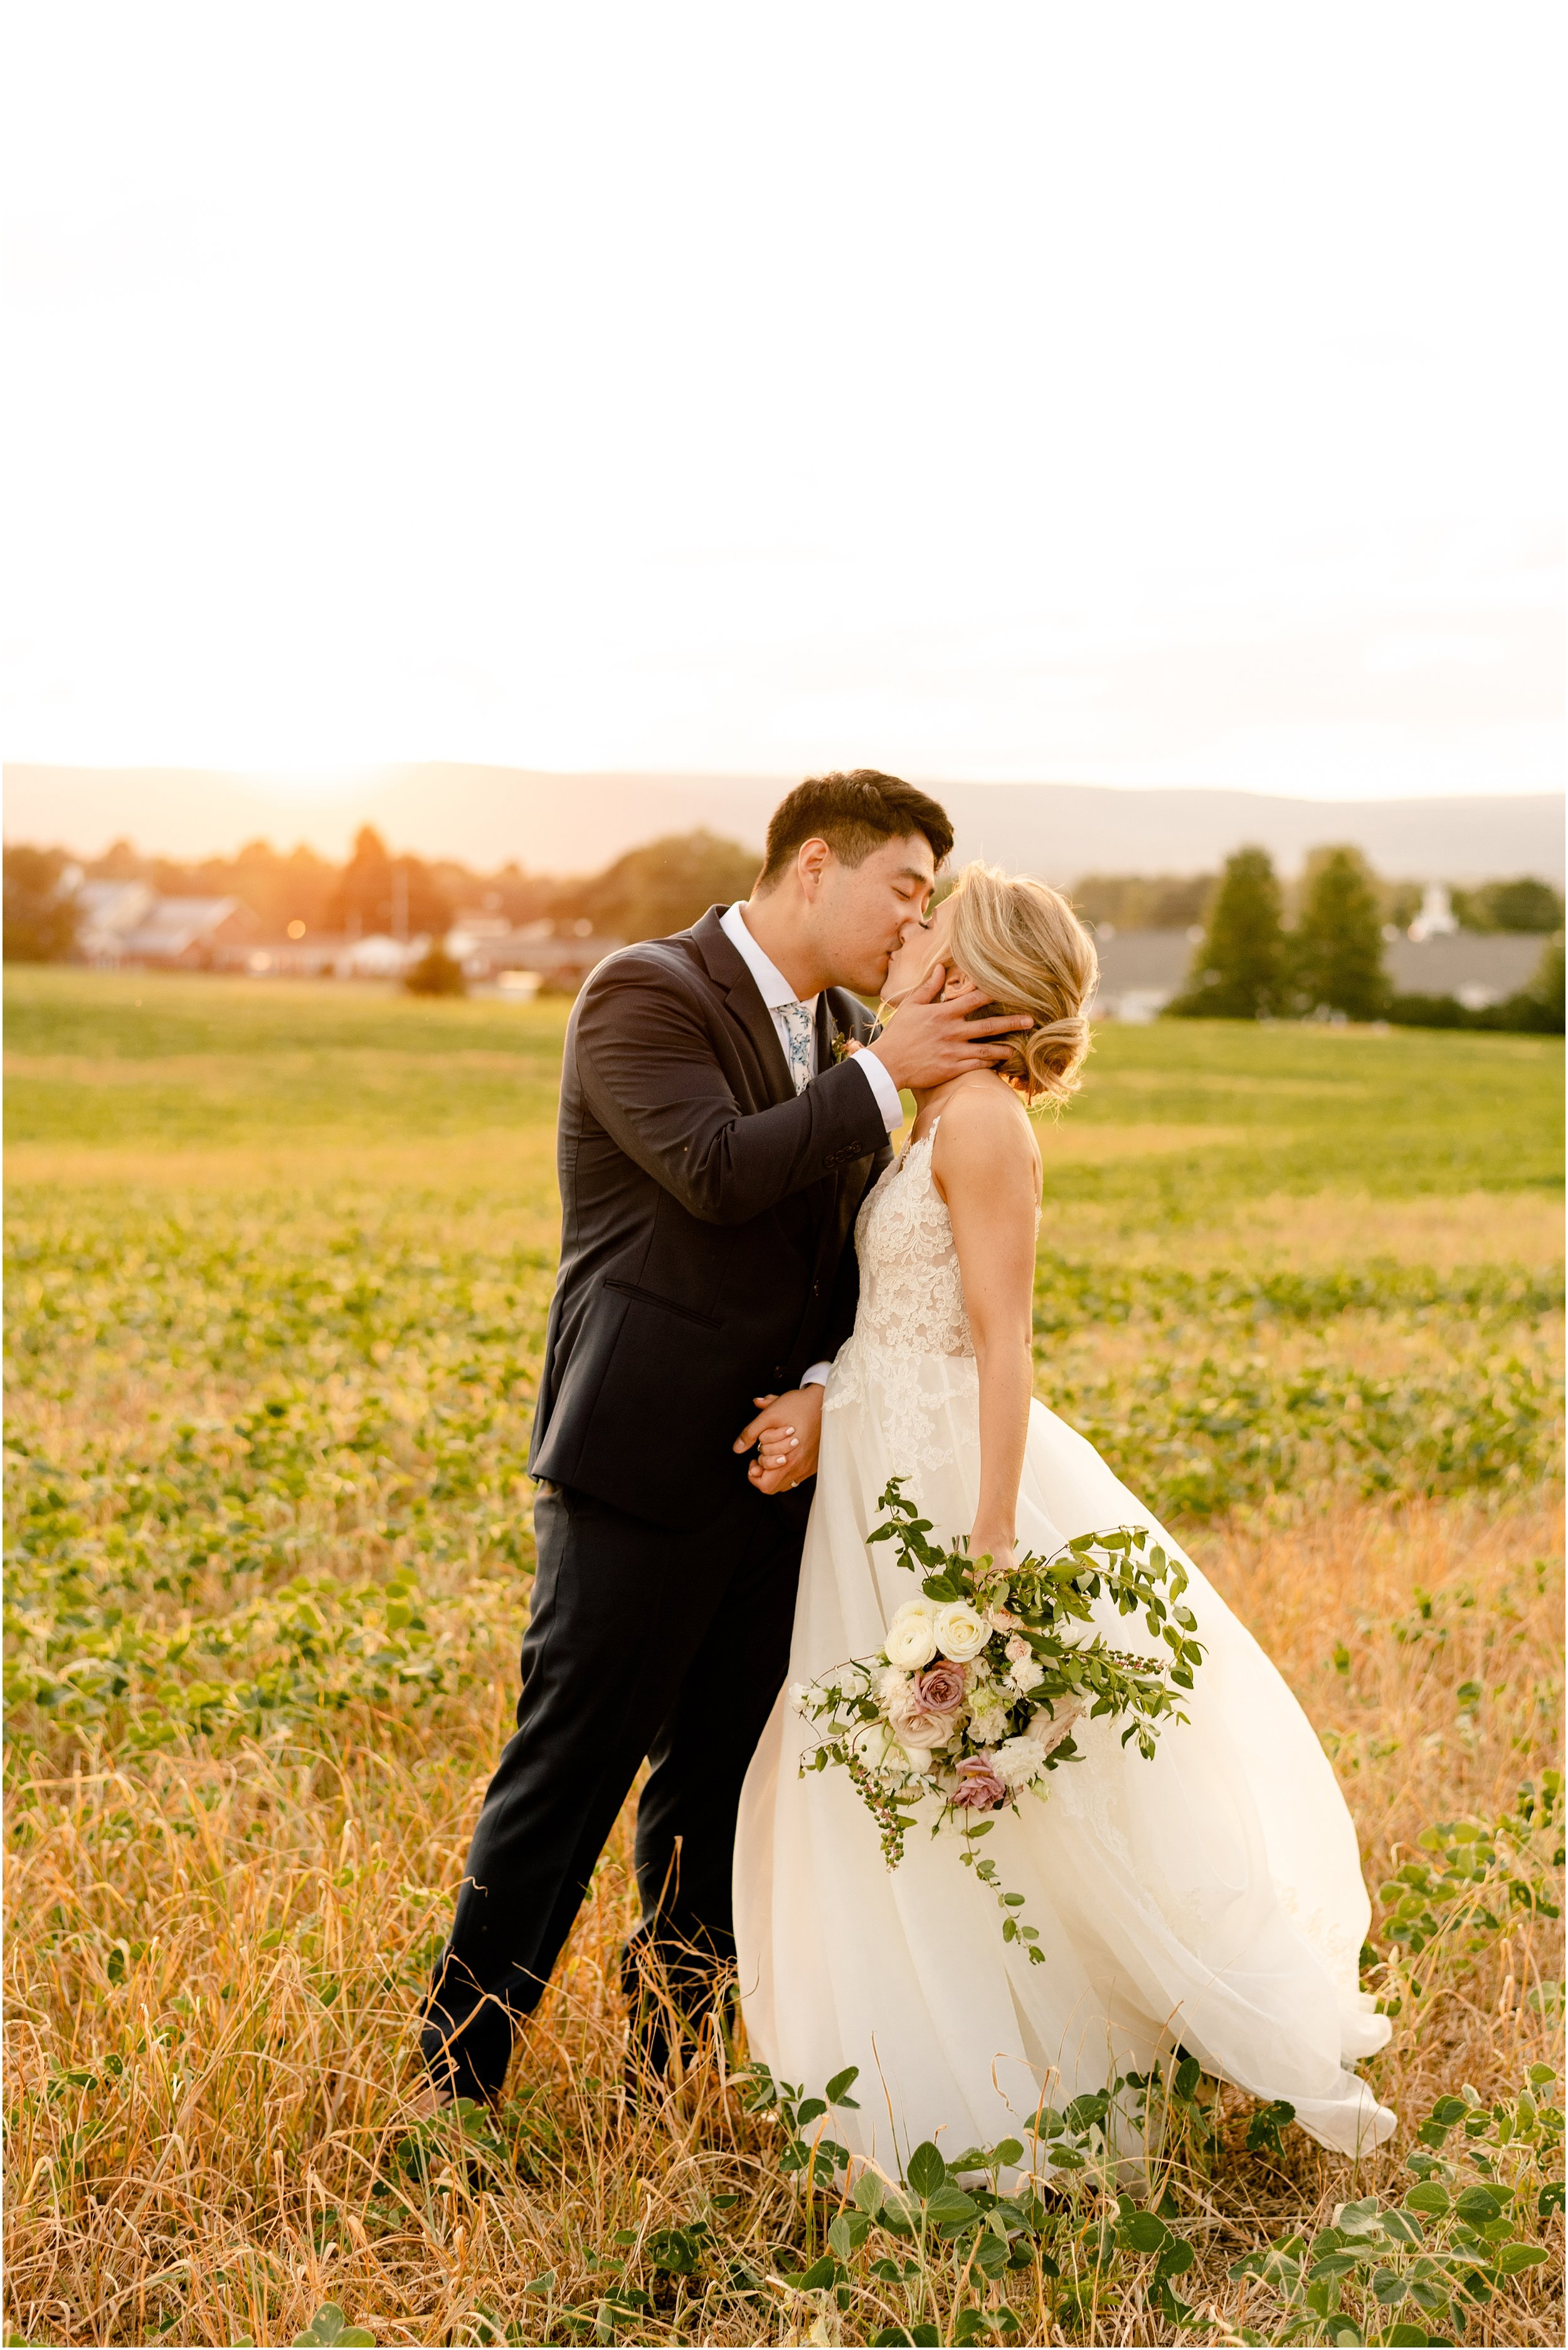 hannah leigh photography Walkers Overlook Wedding Walkersville MD_3557.jpg